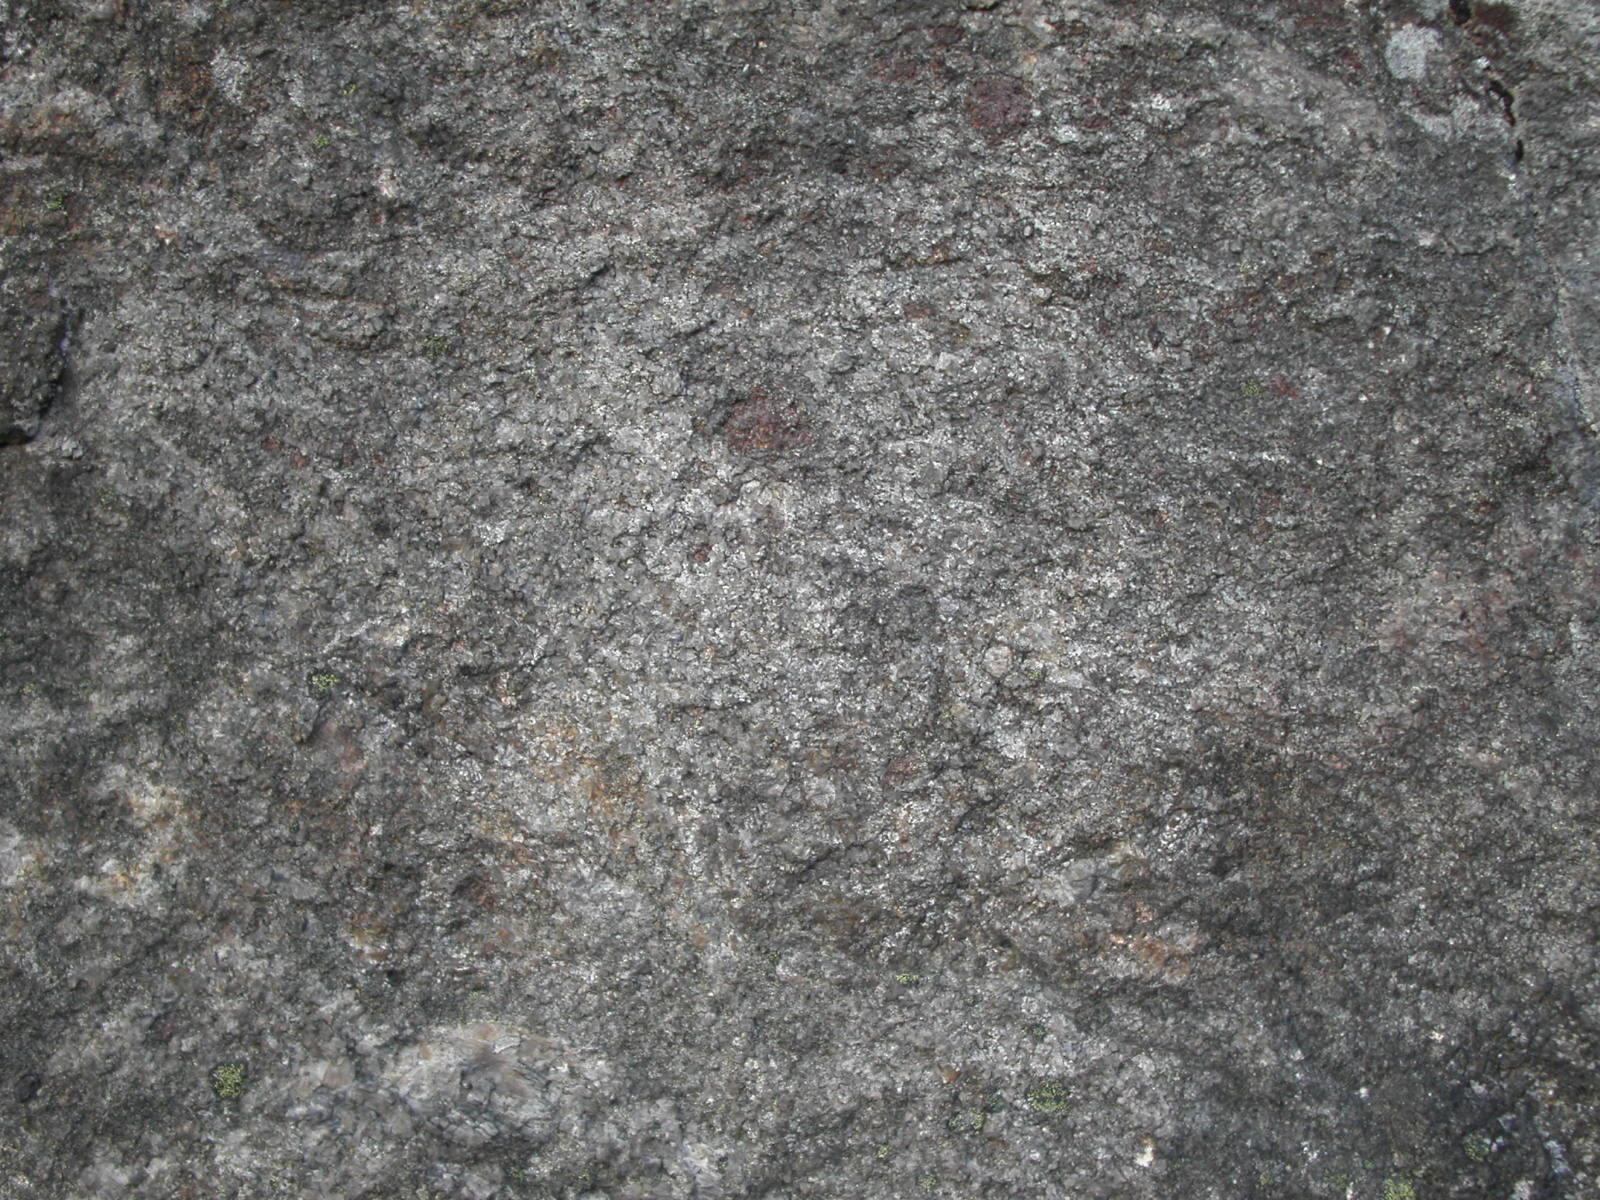 Rock Texture Wallpaper Texture - rock 00010 byRock Texture